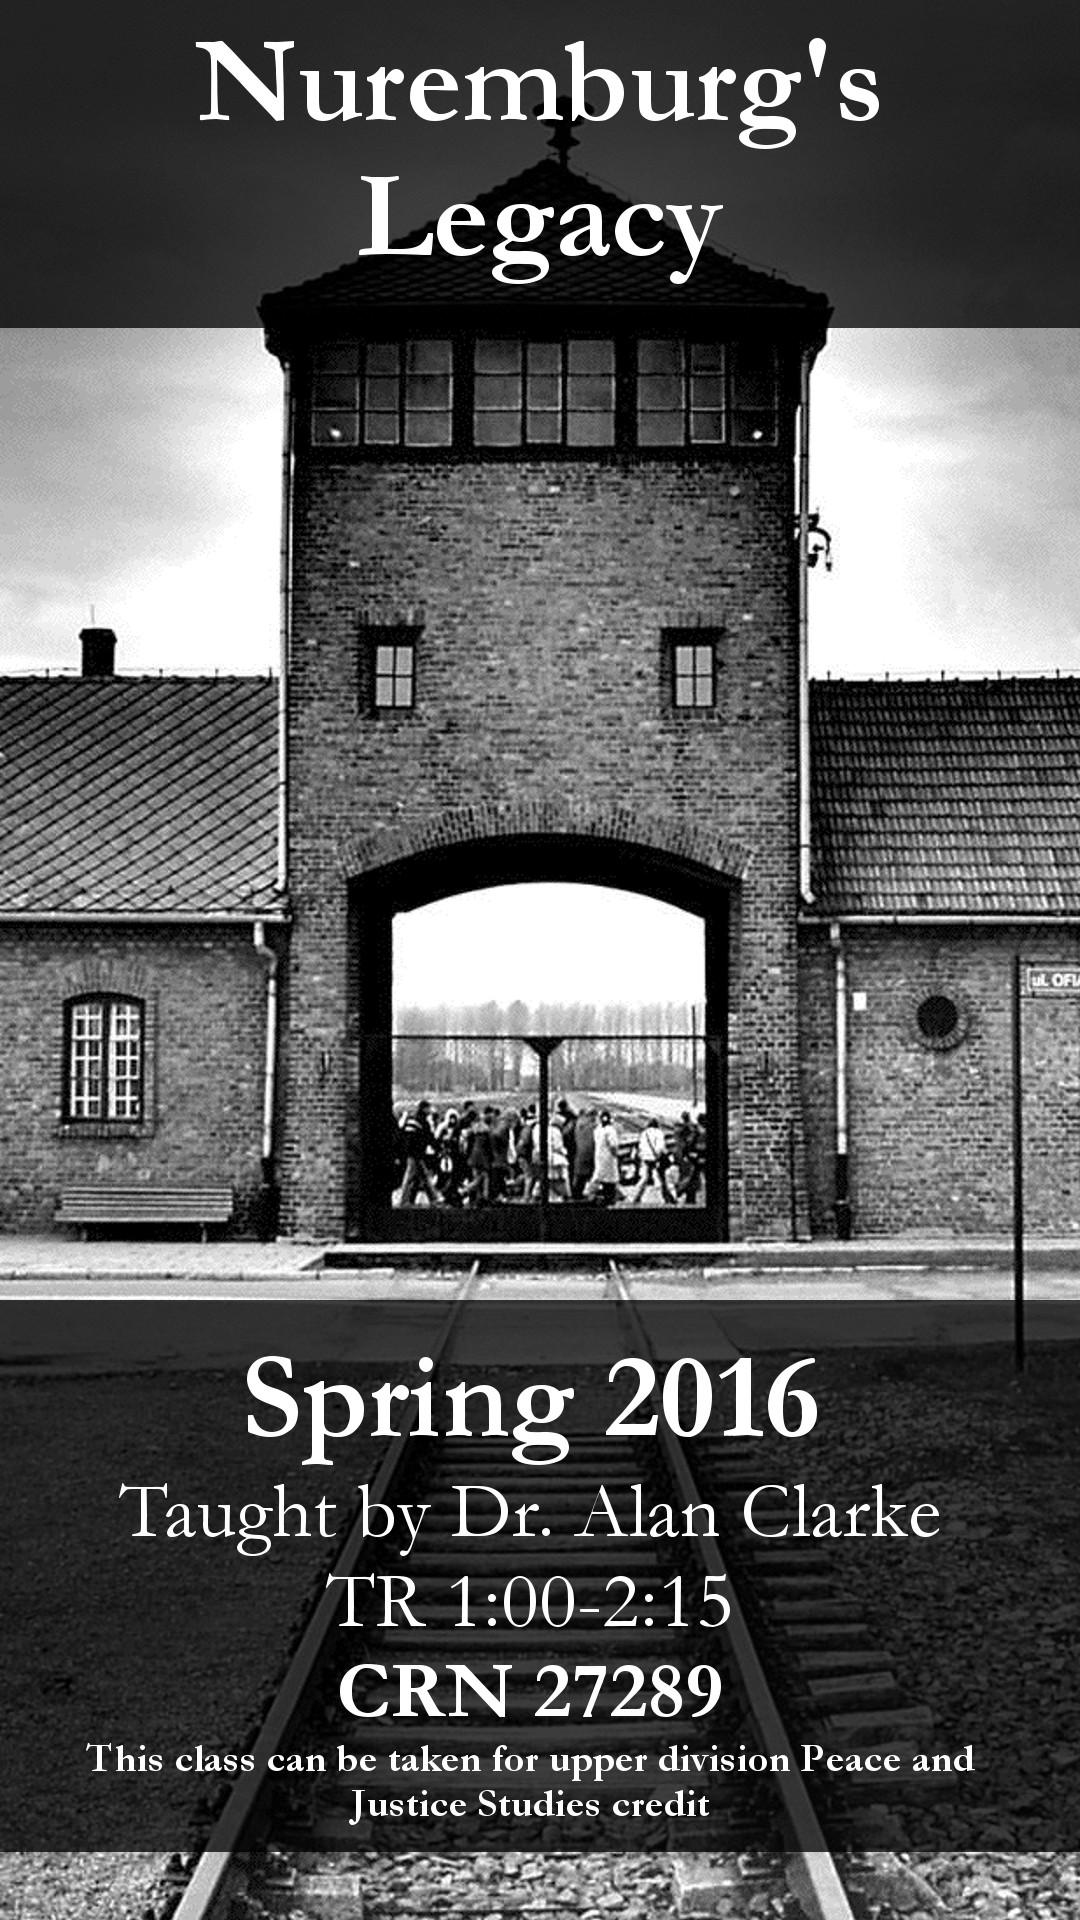 Nuremburg's Legacy